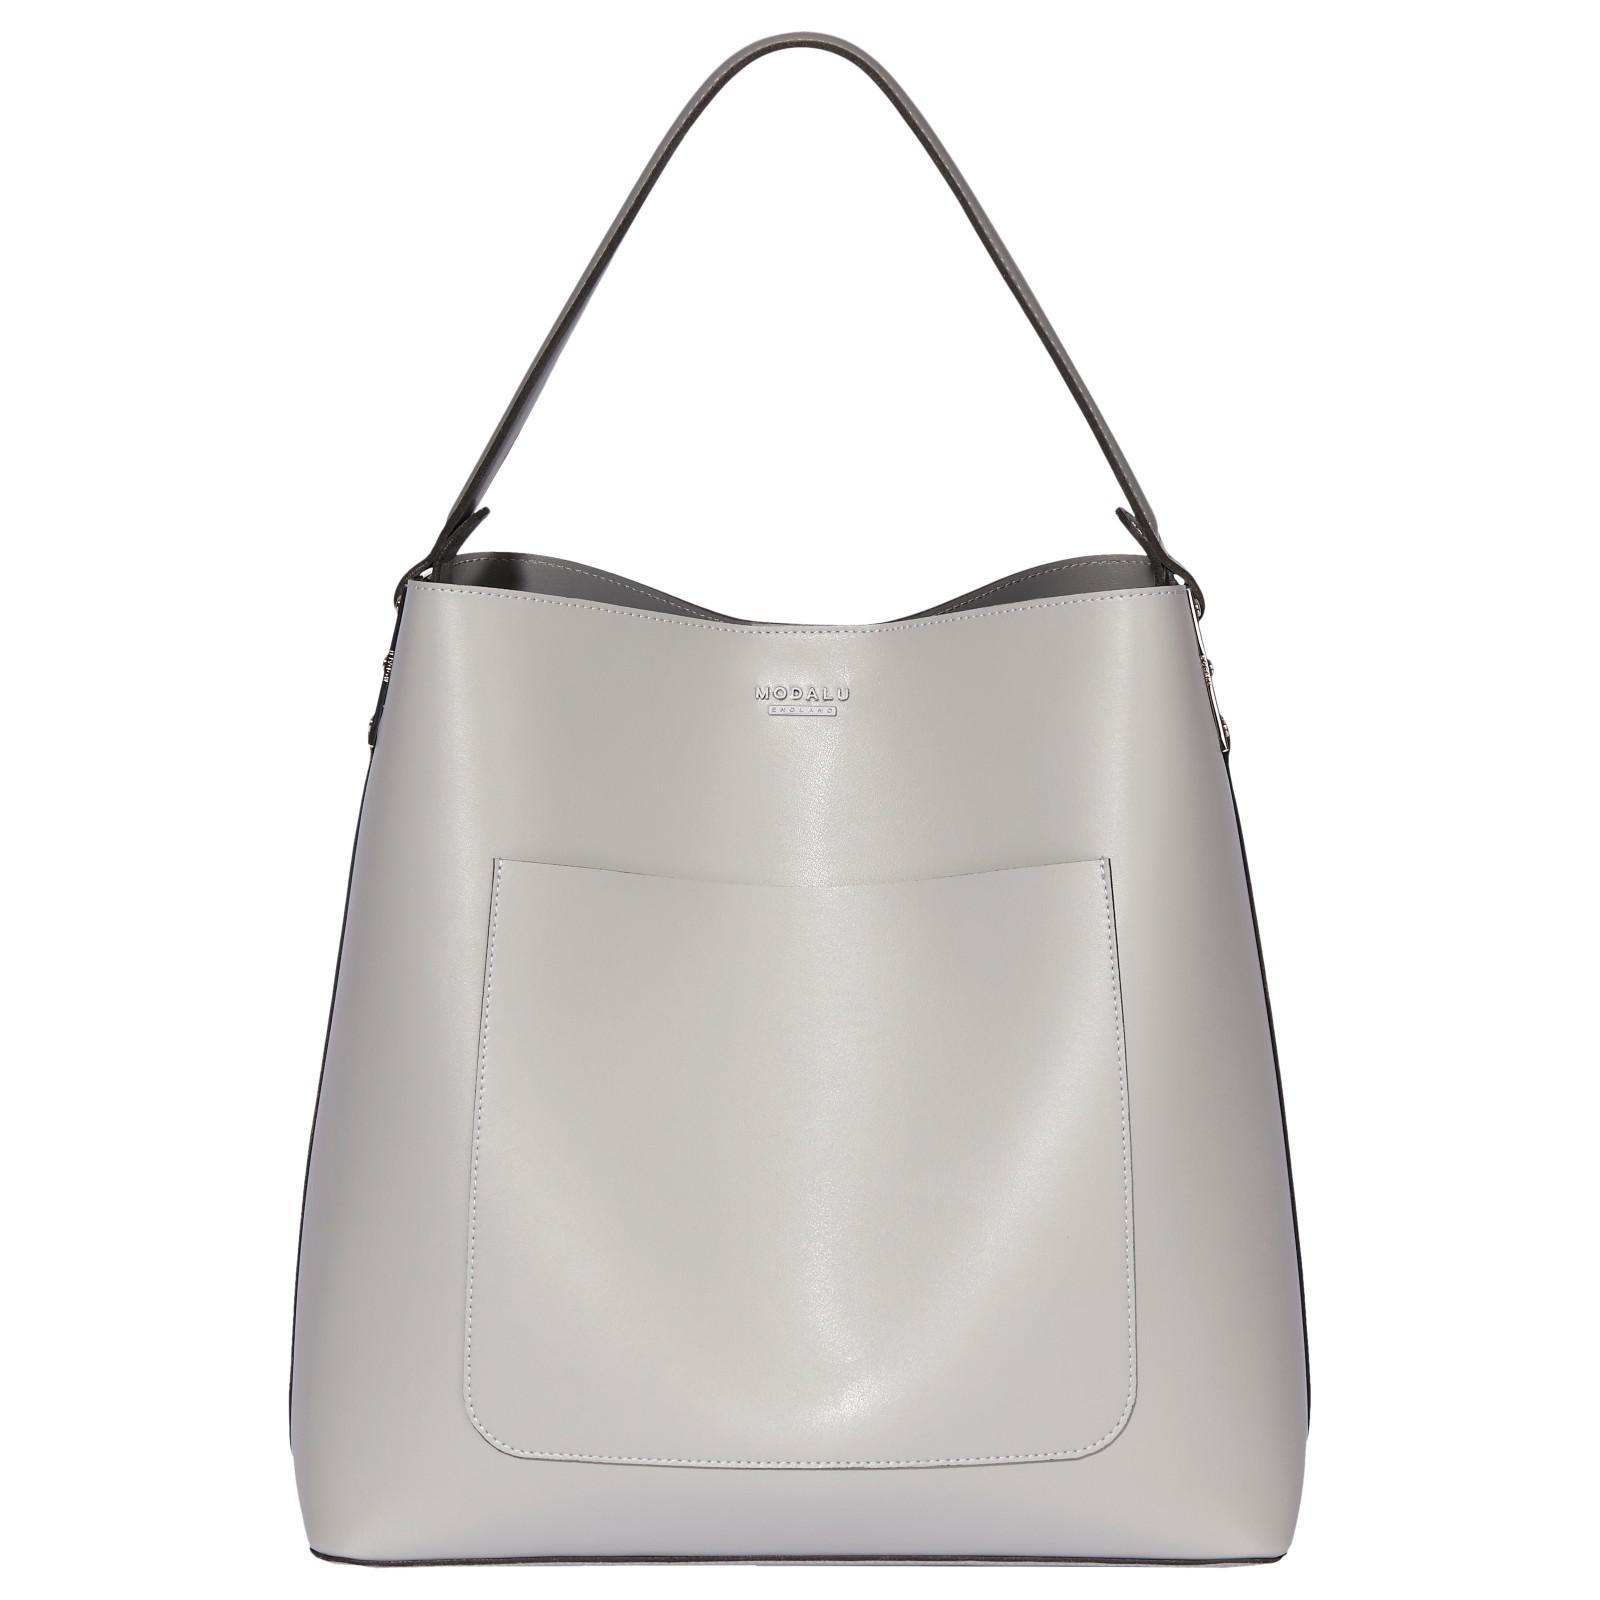 3a2dd1be24a1 Modalu Imogen Leather Shoulder Bag - Lyst